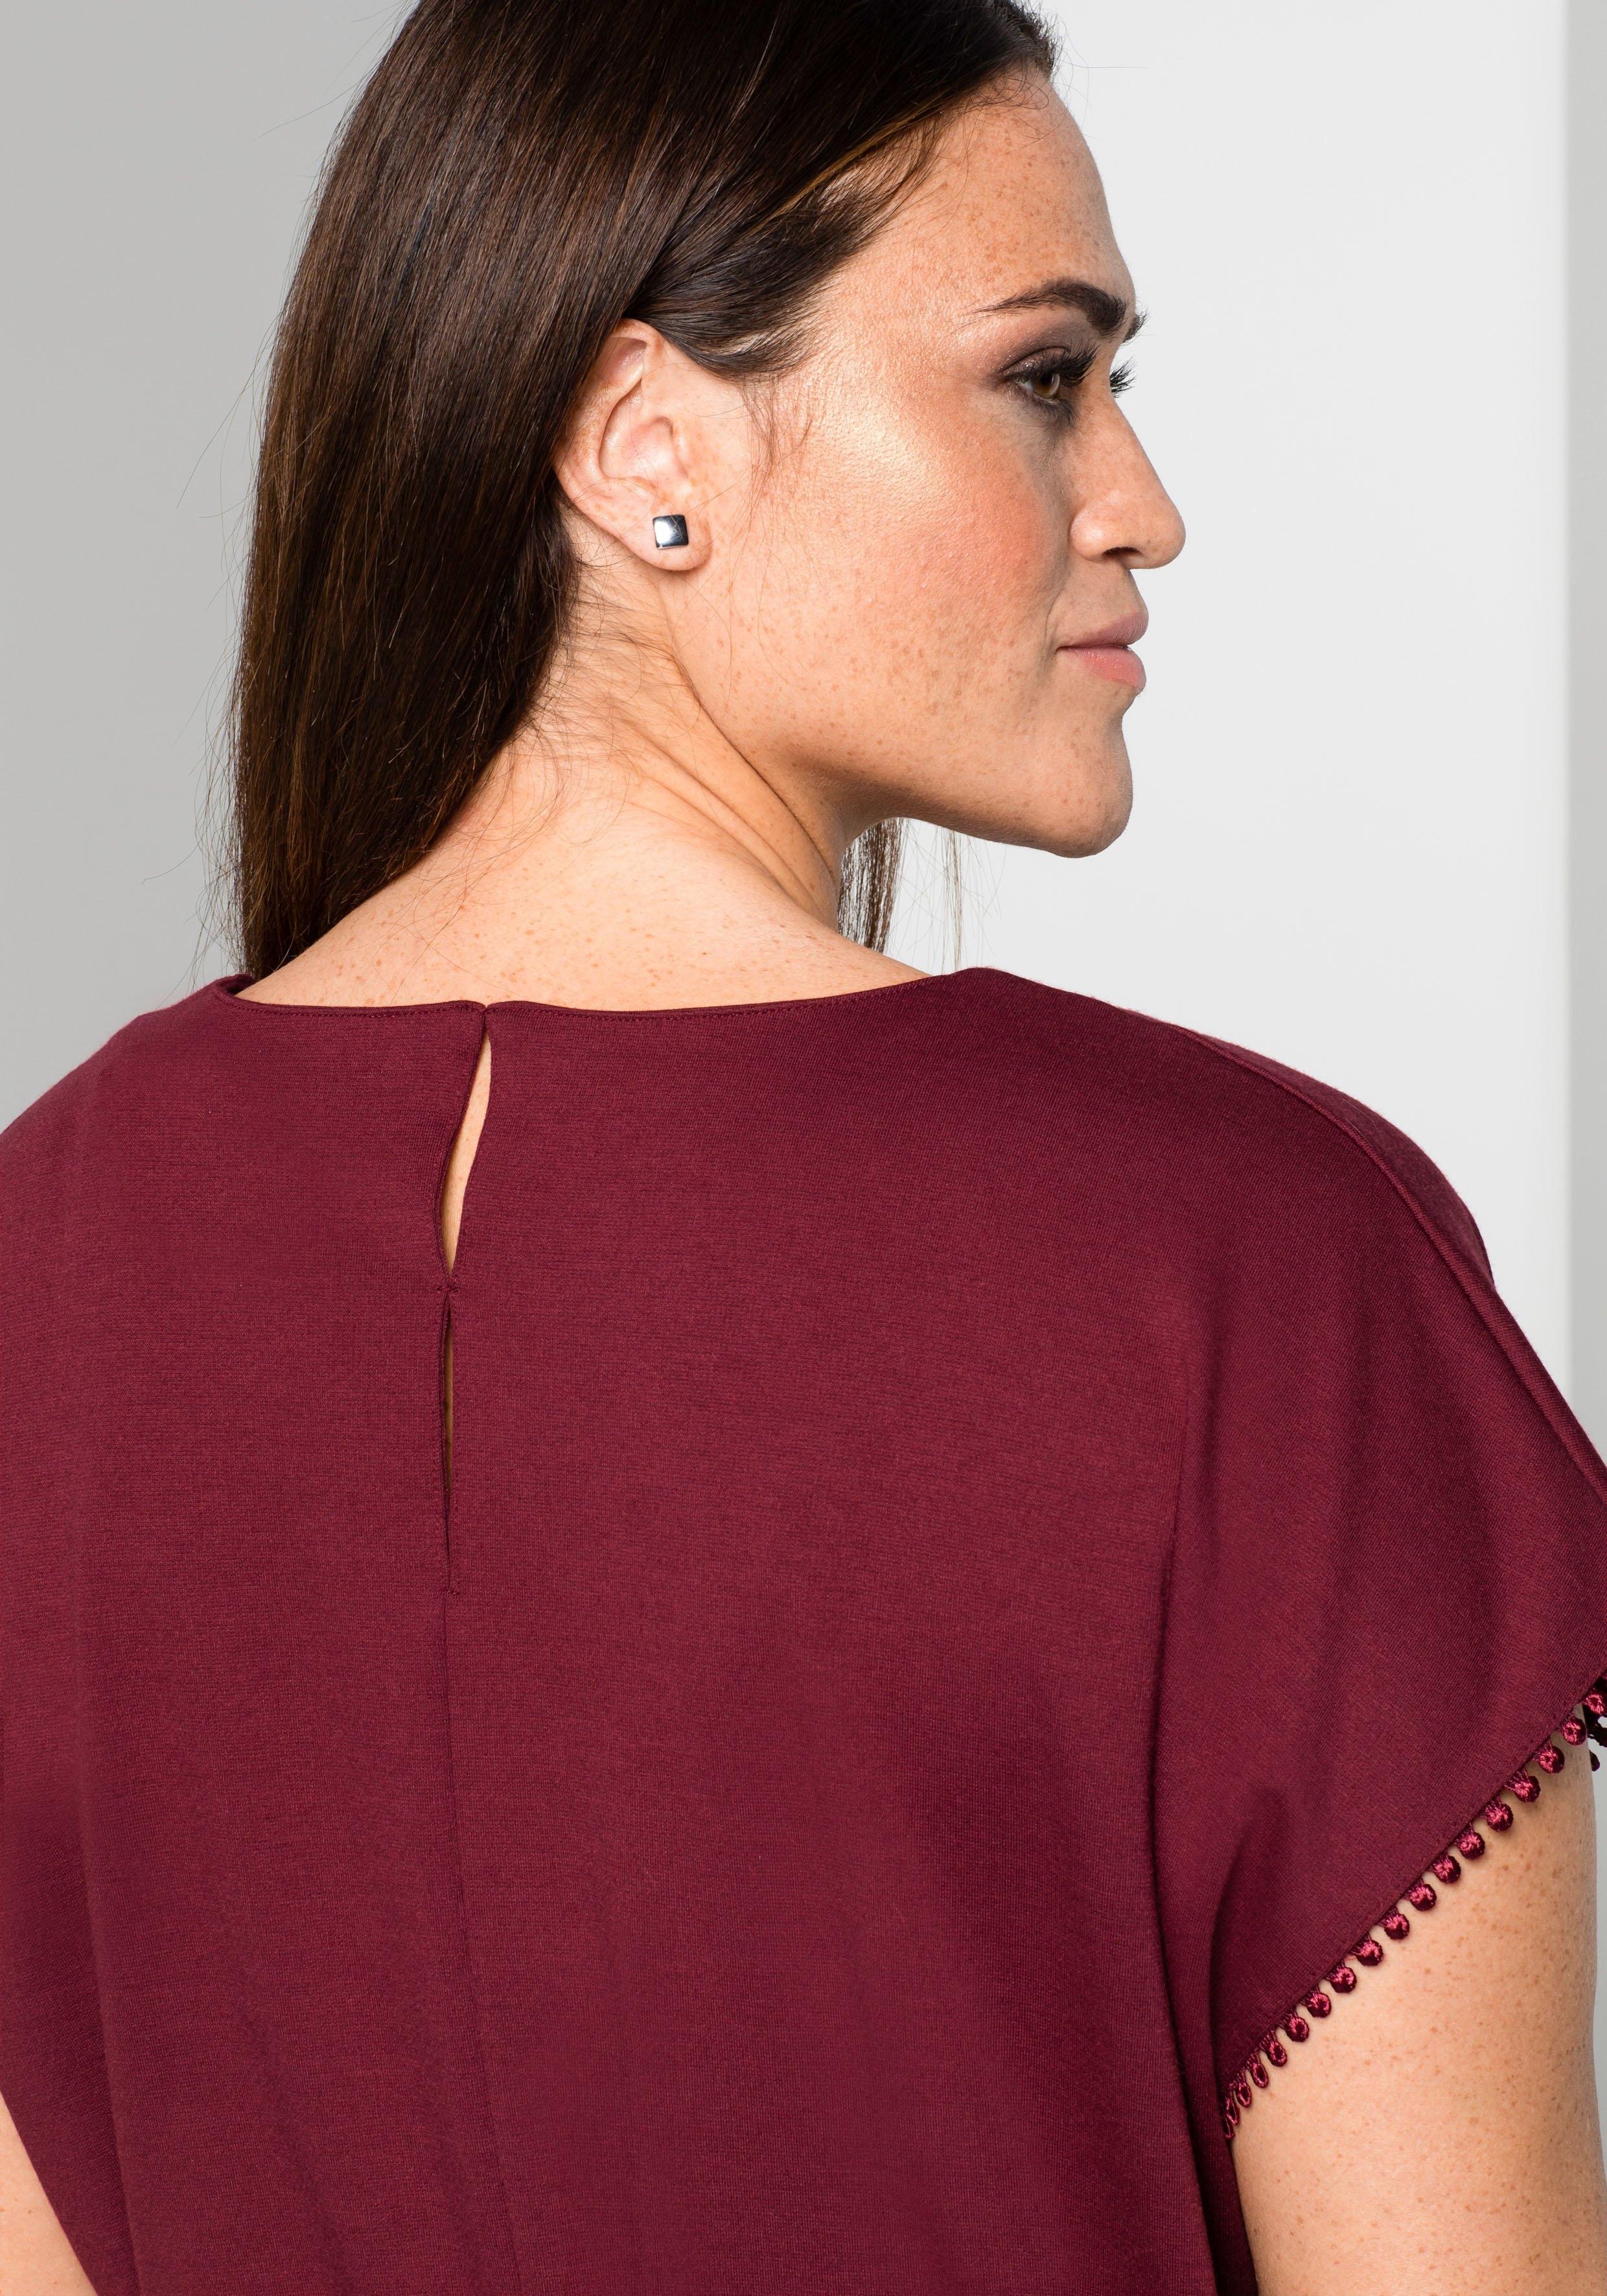 Winkel Online Shirtjurk Sheego Style De In nOk08wP